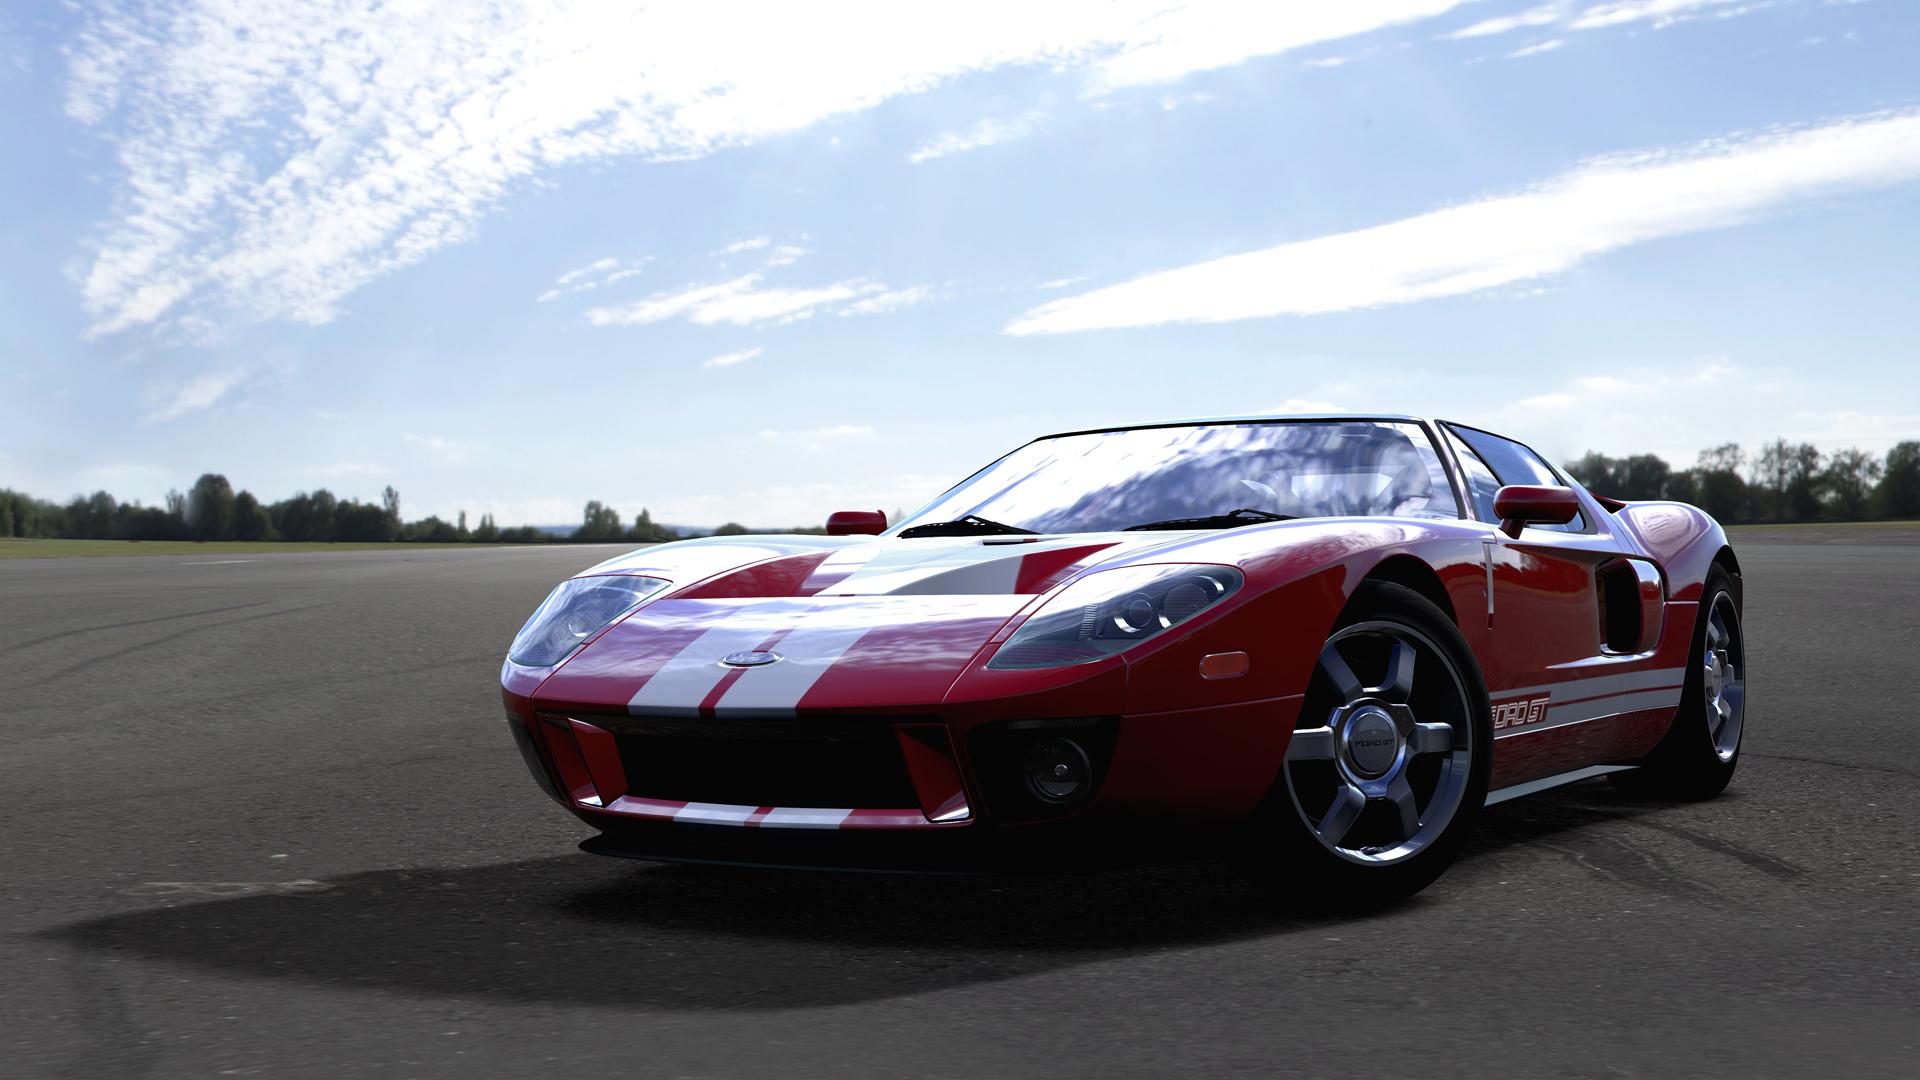 Forza Motorsport 6 Ford GT HD desktop Wallpapers digitalhintnet 1920x1080